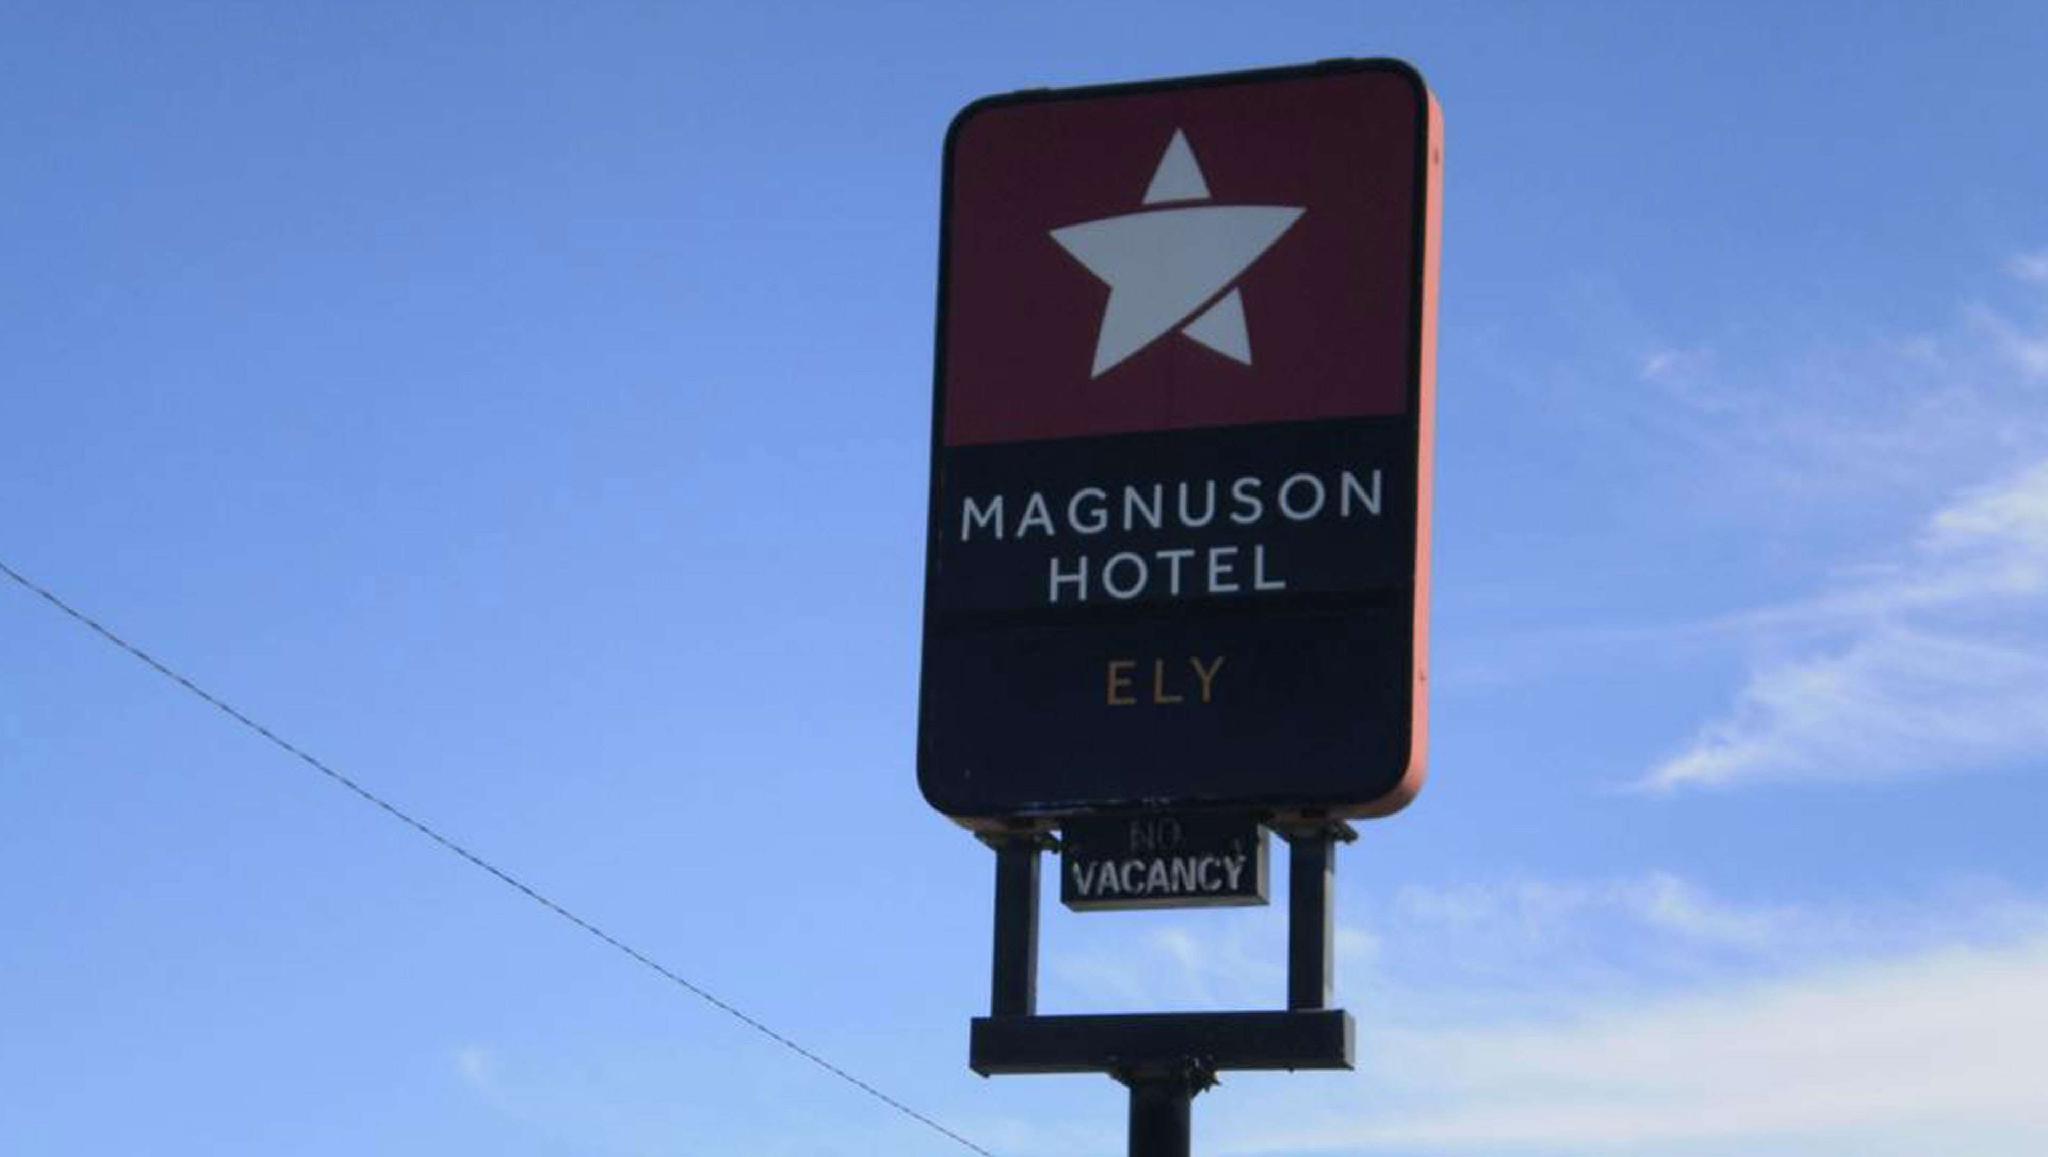 Magnuson Hotel Ely